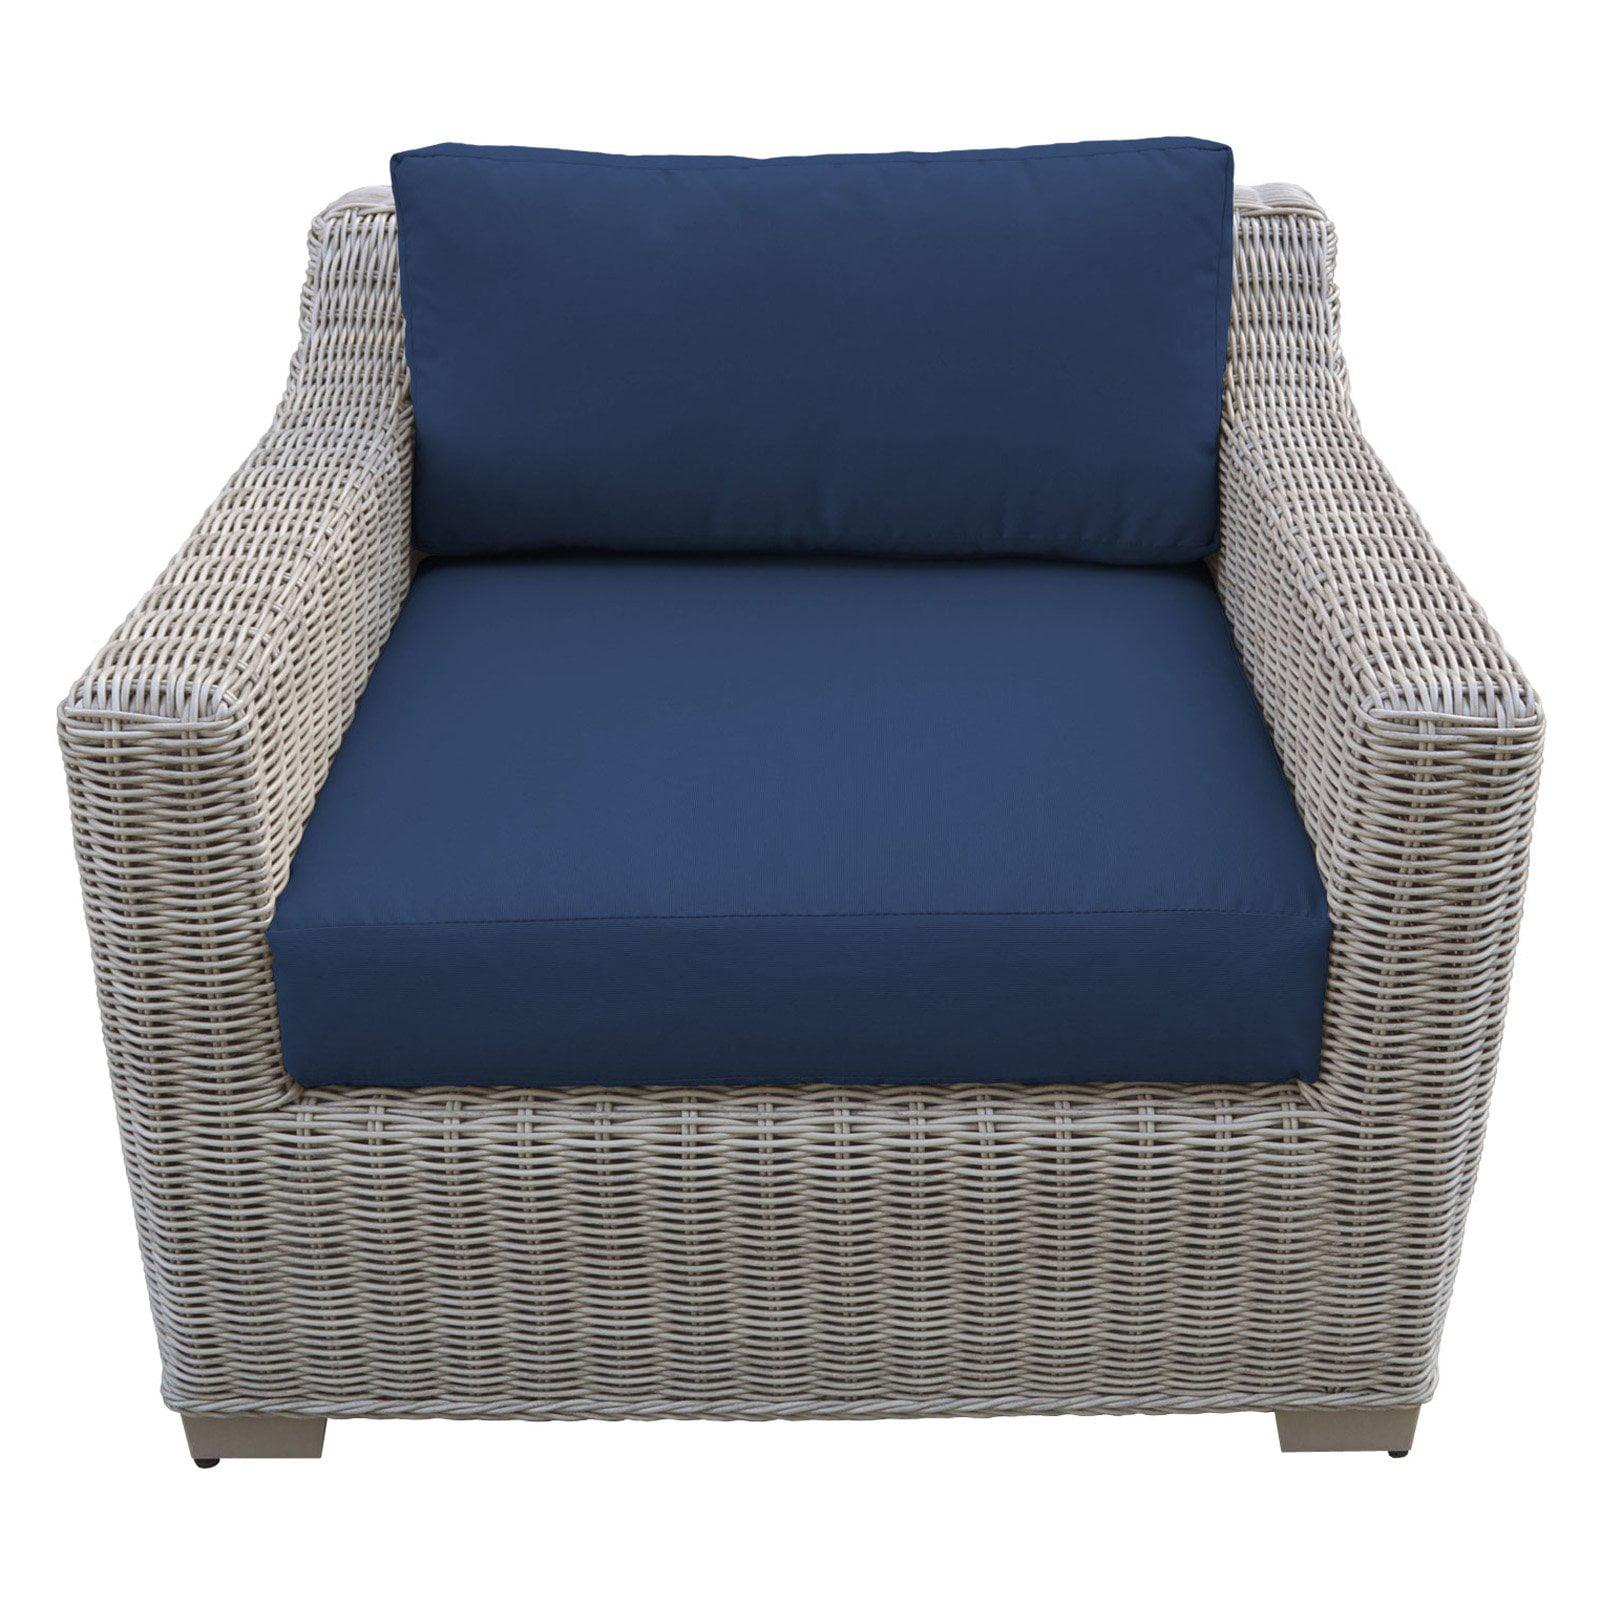 TK Classics Coast Wicker Patio Club Chair